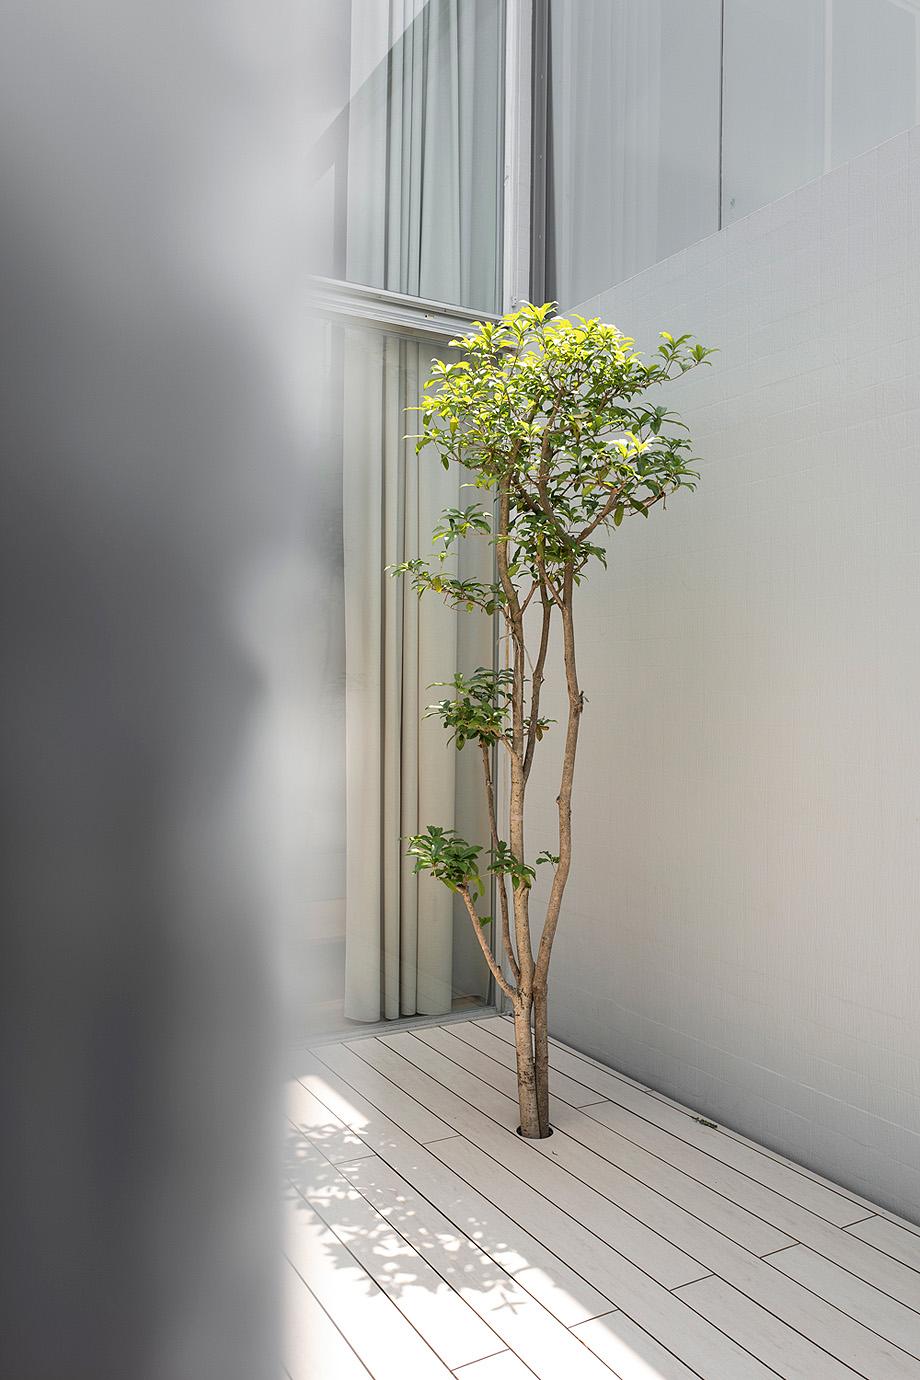 kinuta terrace de keiji ashizawa design y norm architects - foto jonas bjerre-poulsen (10)